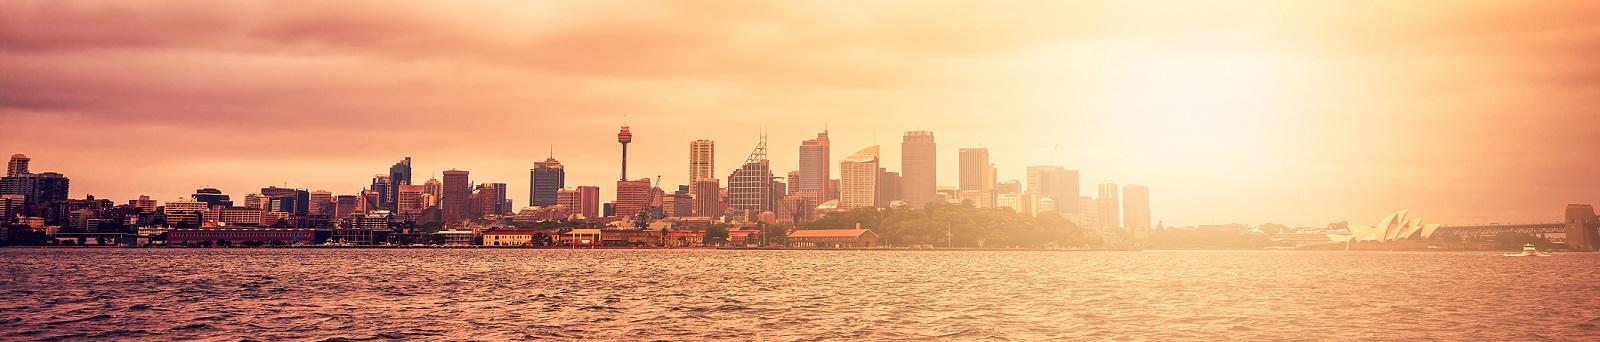 http://australia.taplowgroup.comAustralia Skyline 2